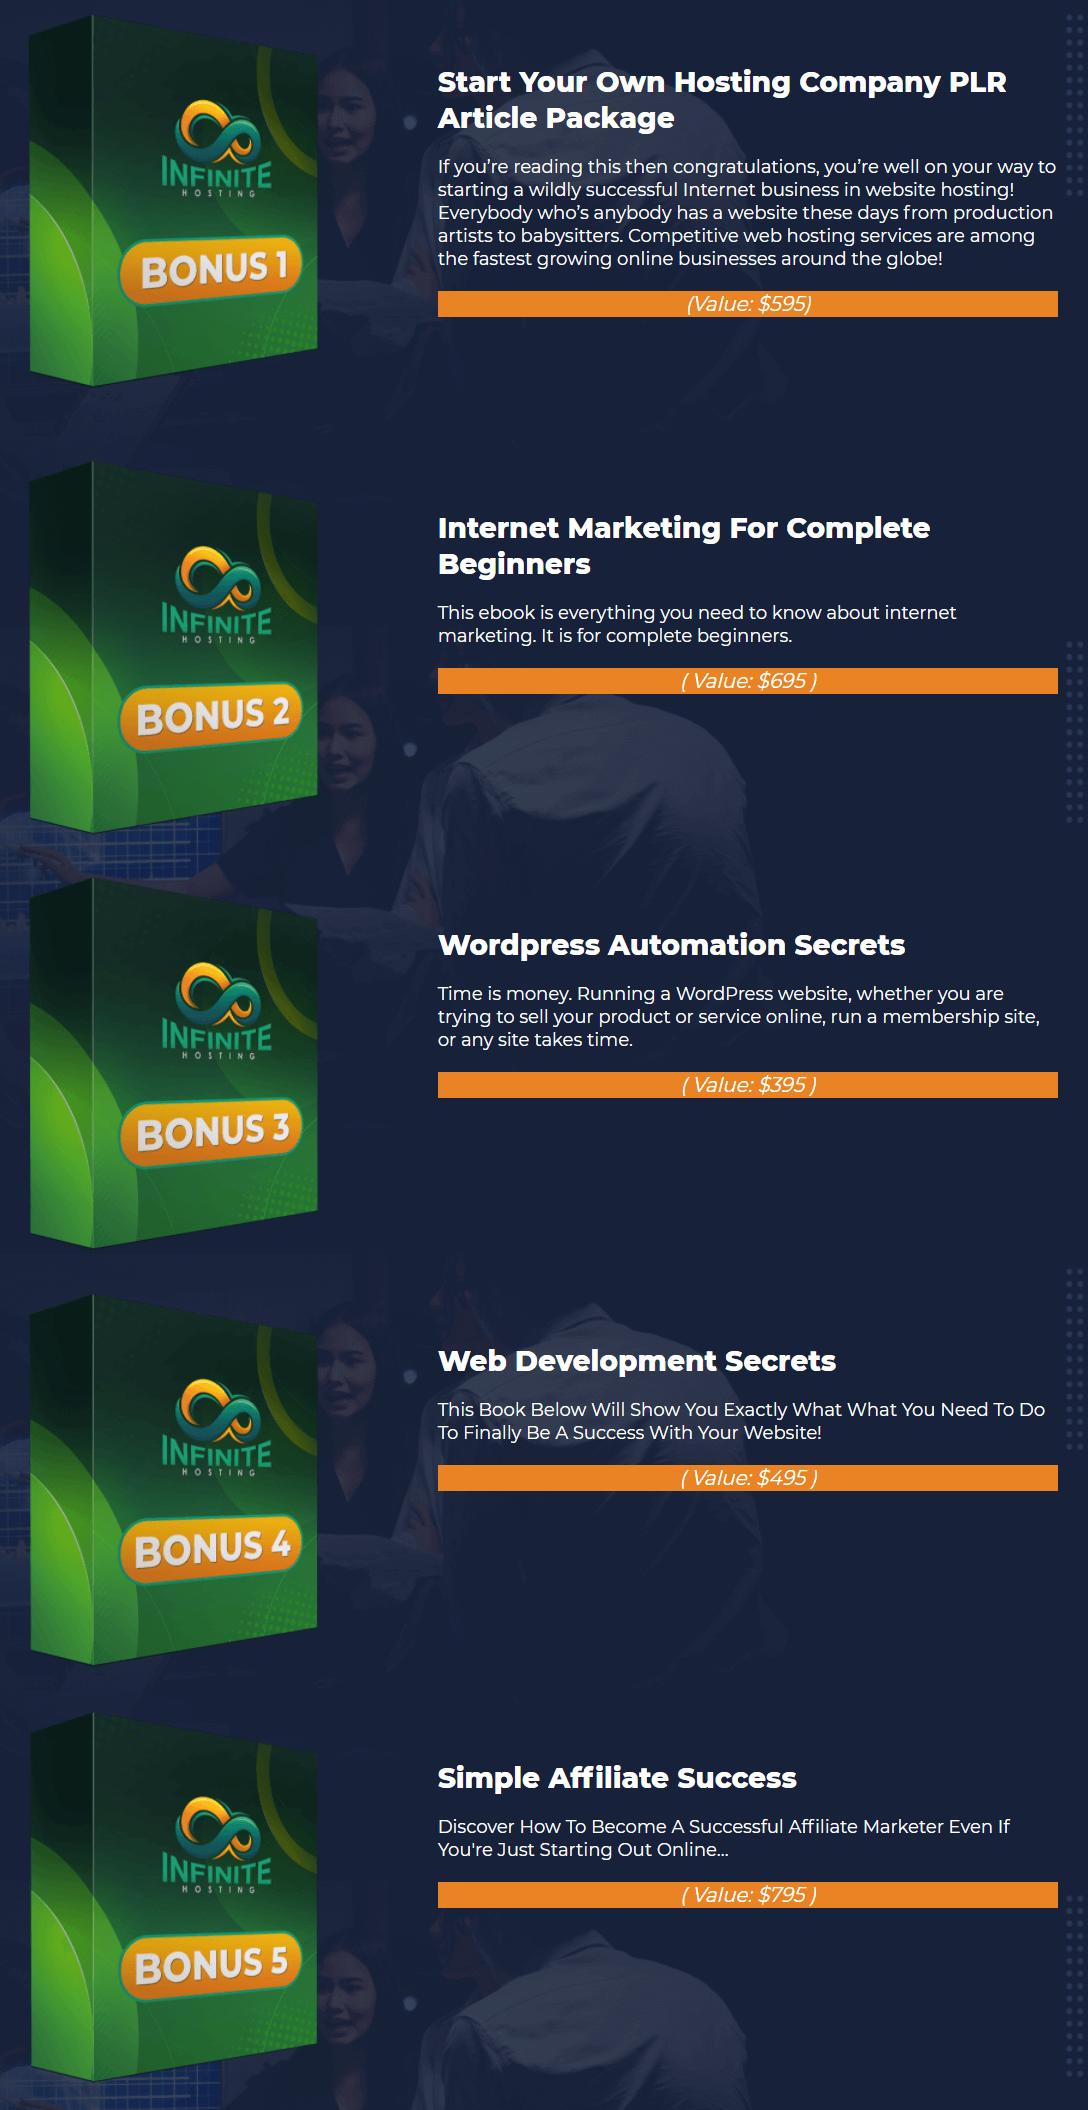 Infinite-Hosting-bonus